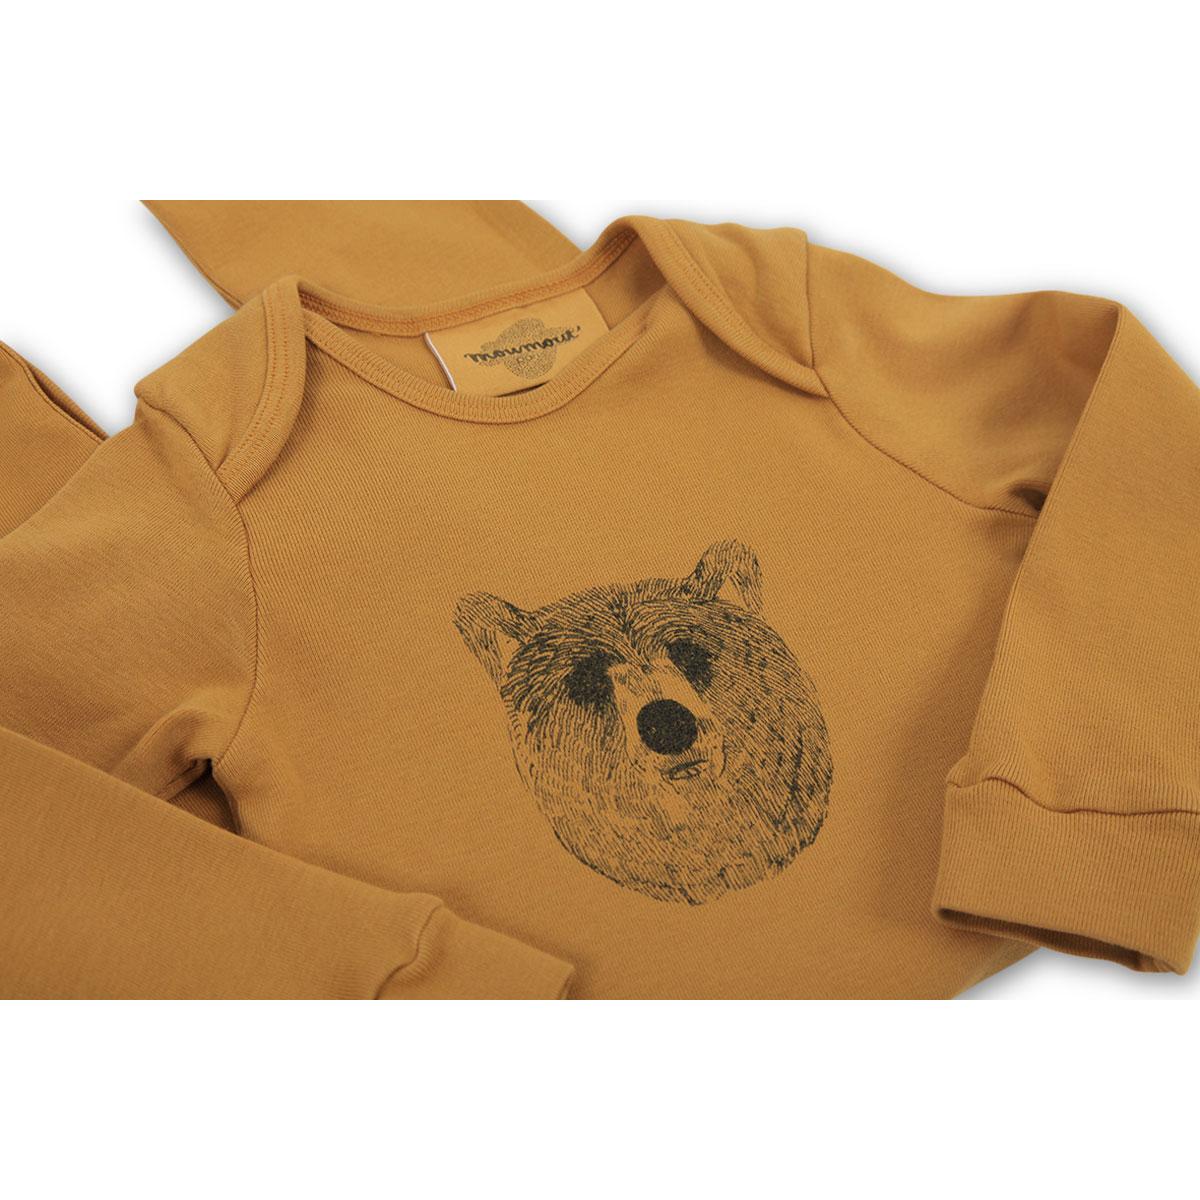 1b17314057858 Pyjama Bobo - Baloo   Moutarde - 3 Mois (BOBO-BALOO-MUSTARD-3M ...